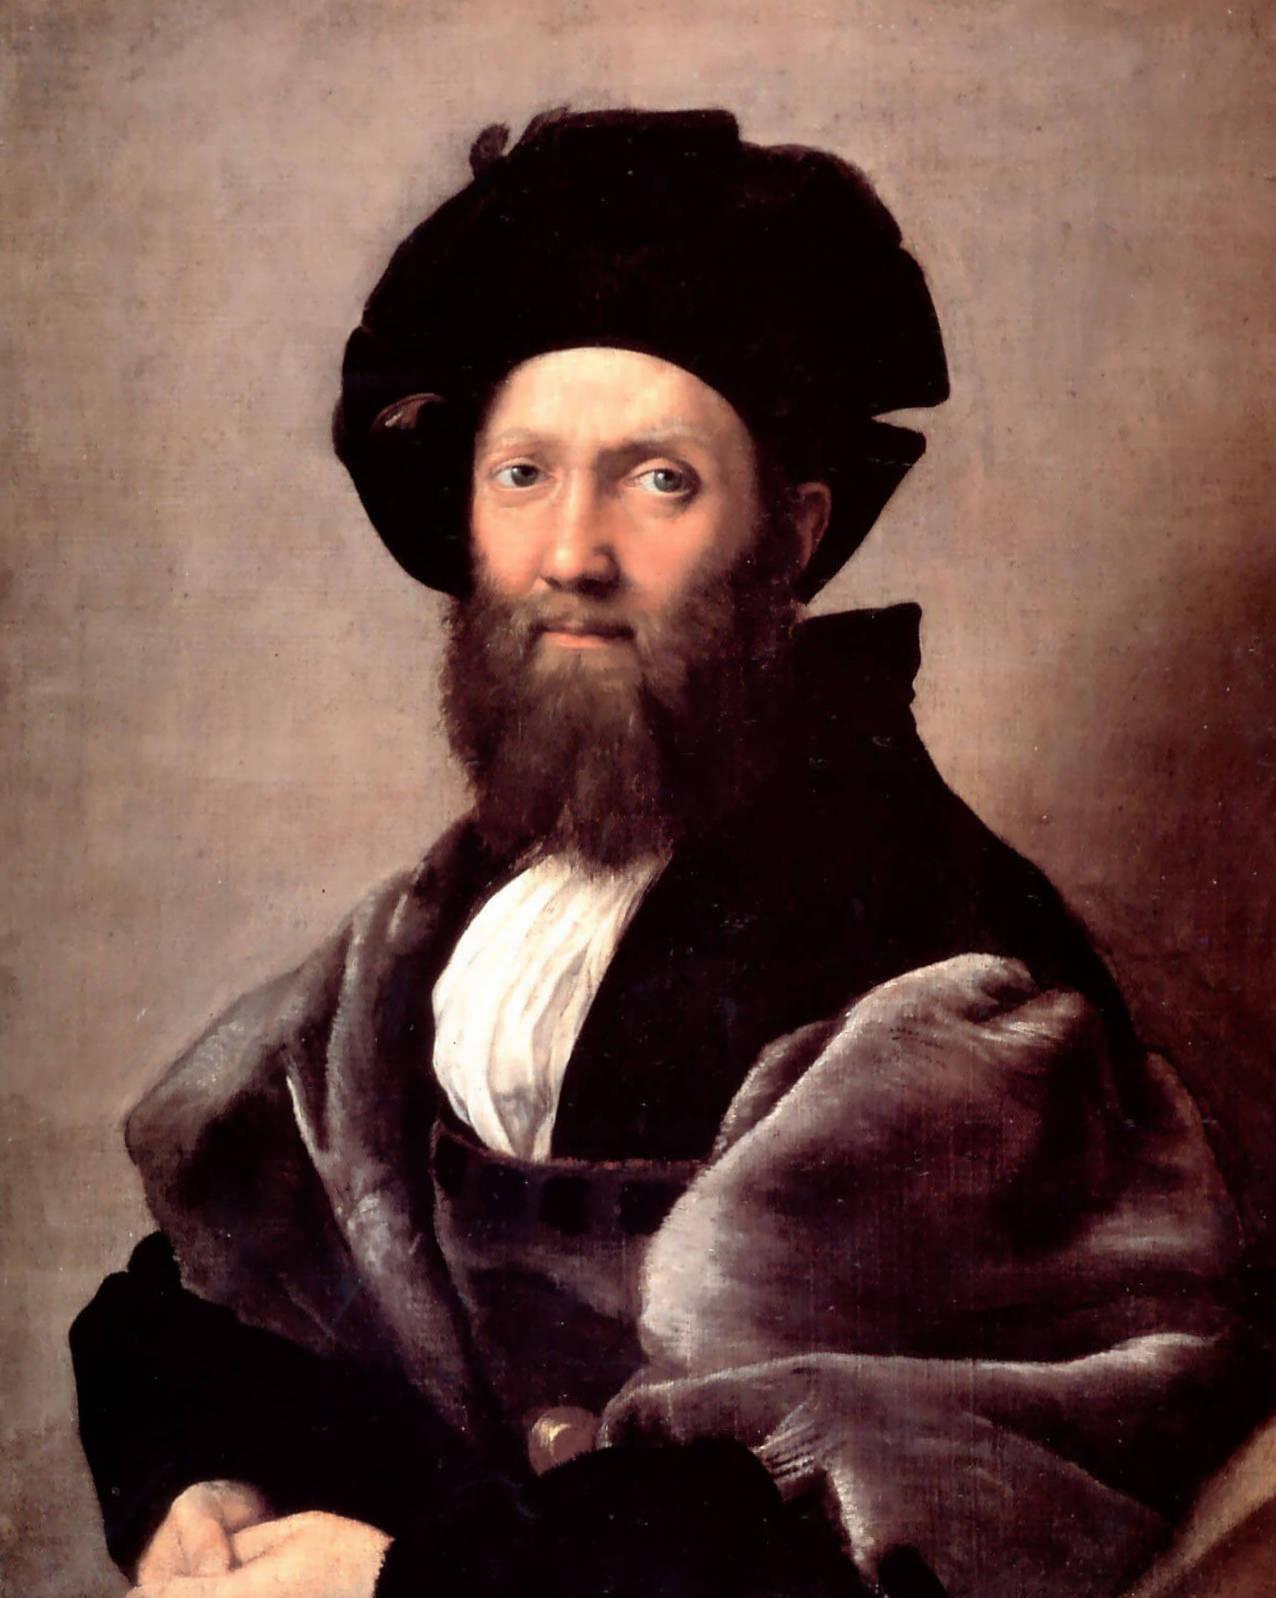 Портрет Бальдассаре Кастильоне - Рафаэль Санти (1514—1515, Лувр, Париж)